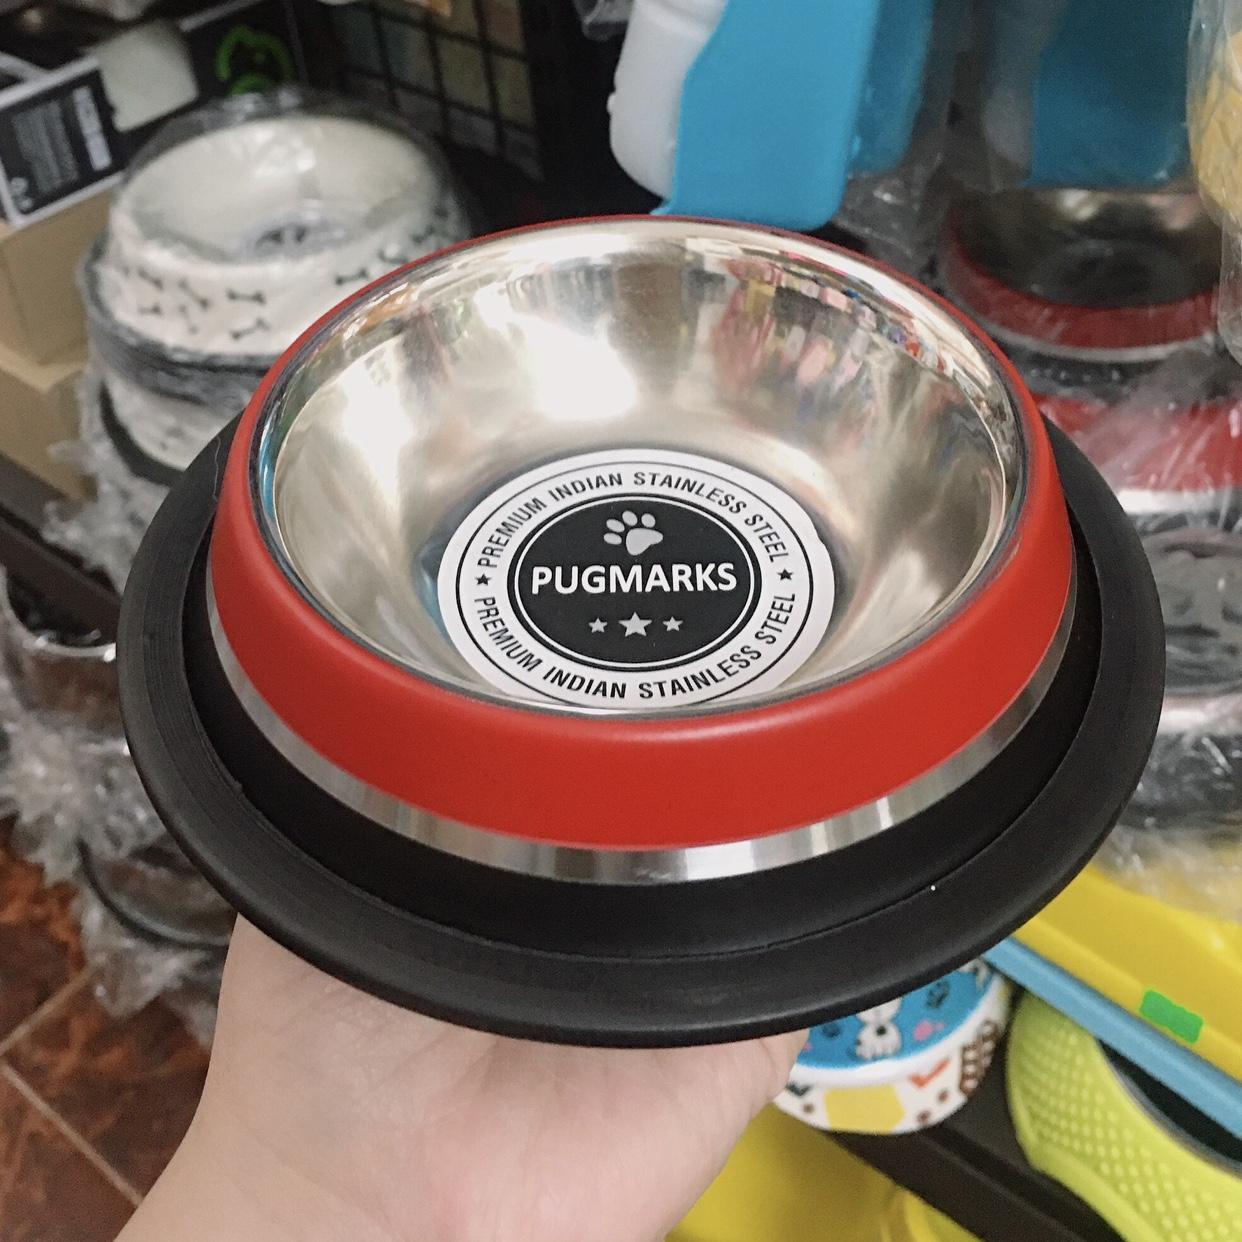 Tô | Chén Melamine Inox Đỏ/ Đen PUGMARKS FEEDY [5 sizes]